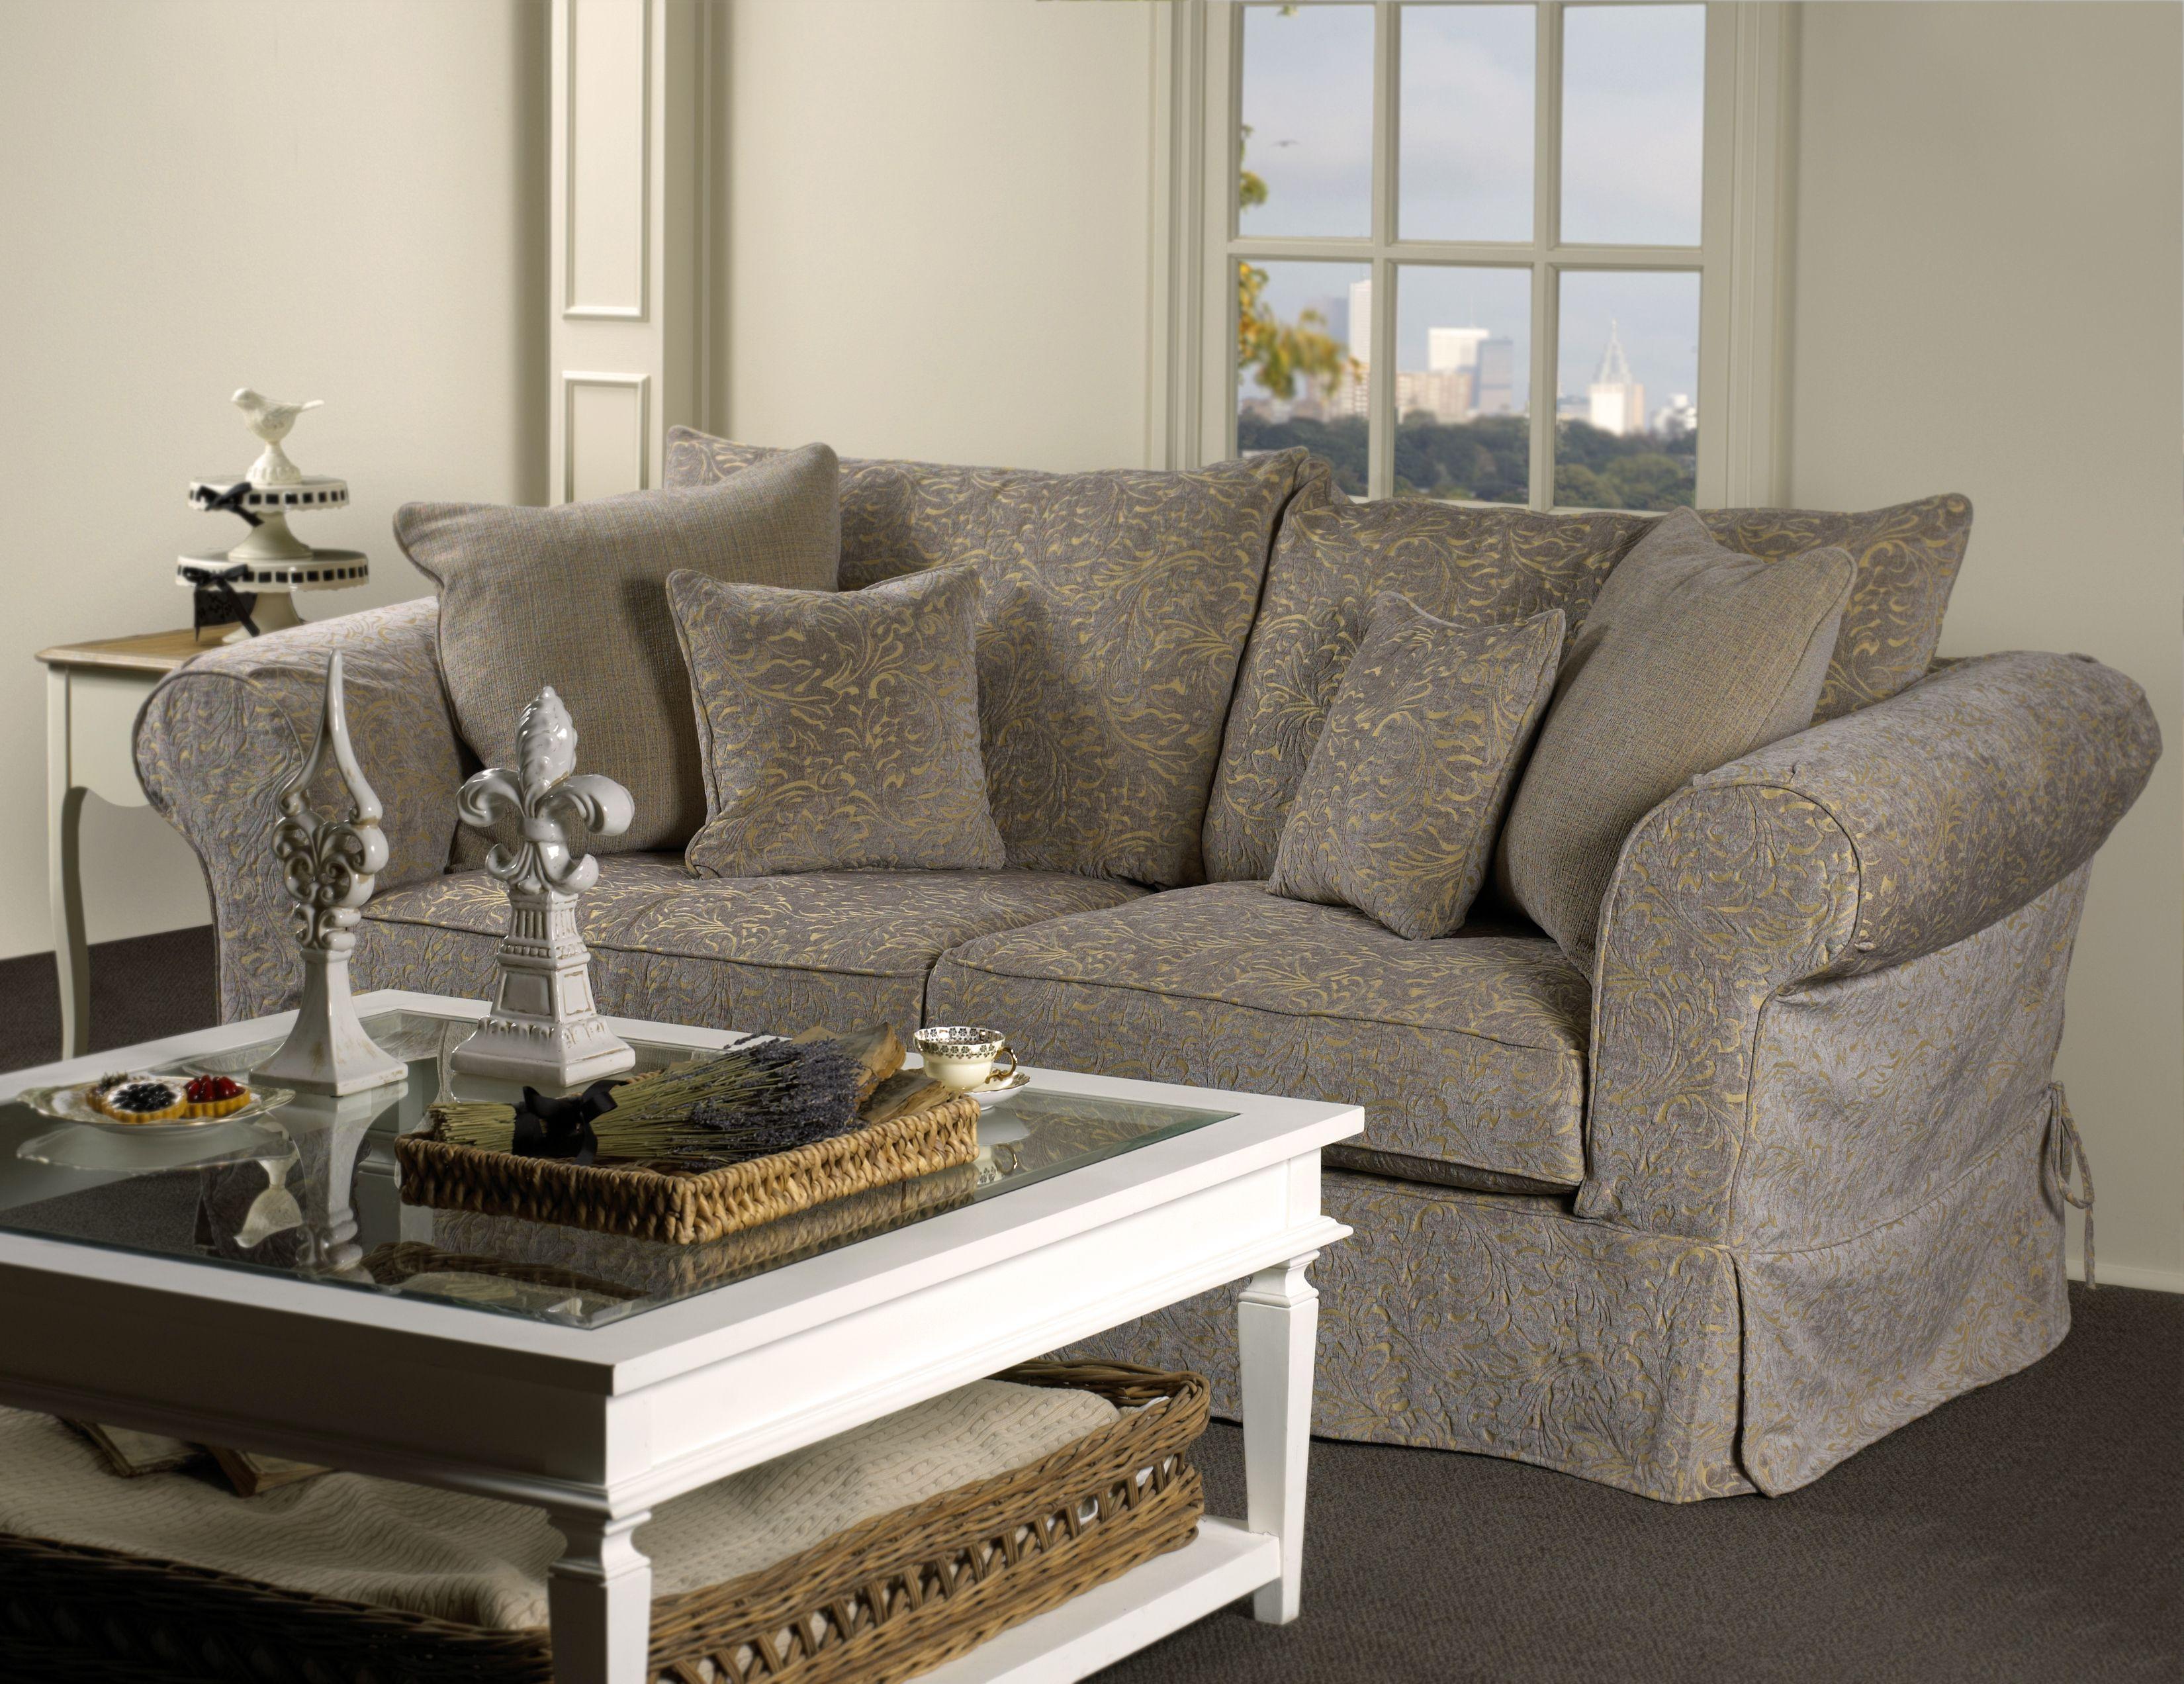 9043 Slipcover Sofa In Avanti U0026 Vega Goldenrod Fabric #frenchcountry  Http://www